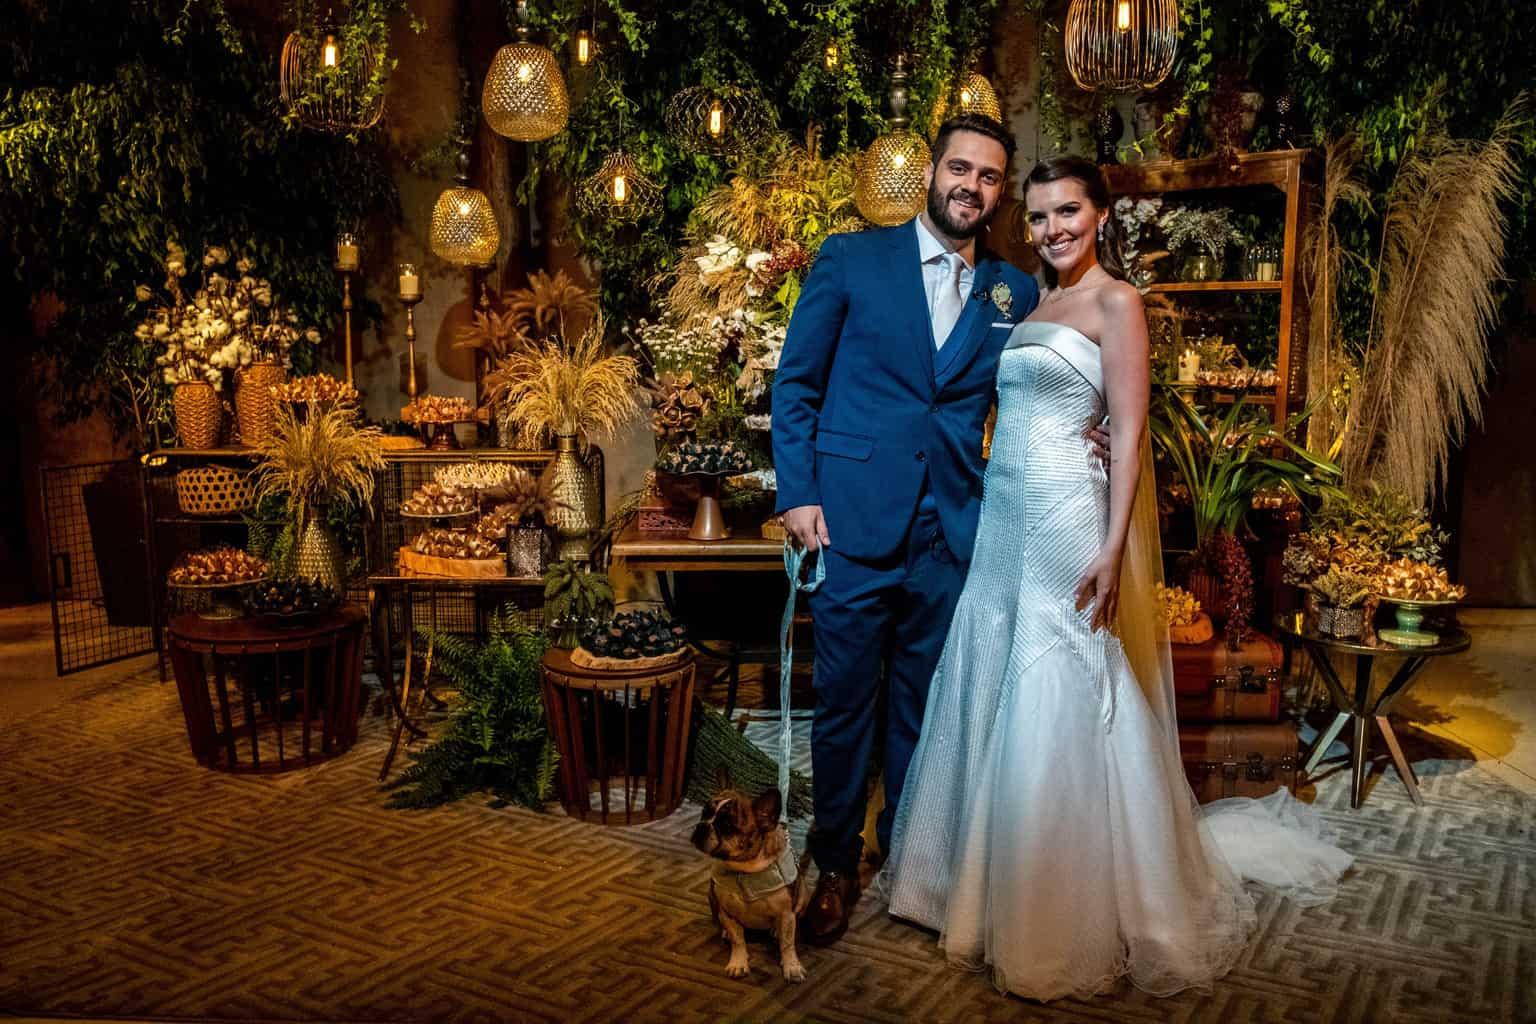 Bel-Benkler-eventos-Casamento-Ariane-e-Matheus-cerimonia-decoracao-contemporanea-fotografia-Rafael-Bigarelli-noivos-na-pista-Spazio-Giardini-39